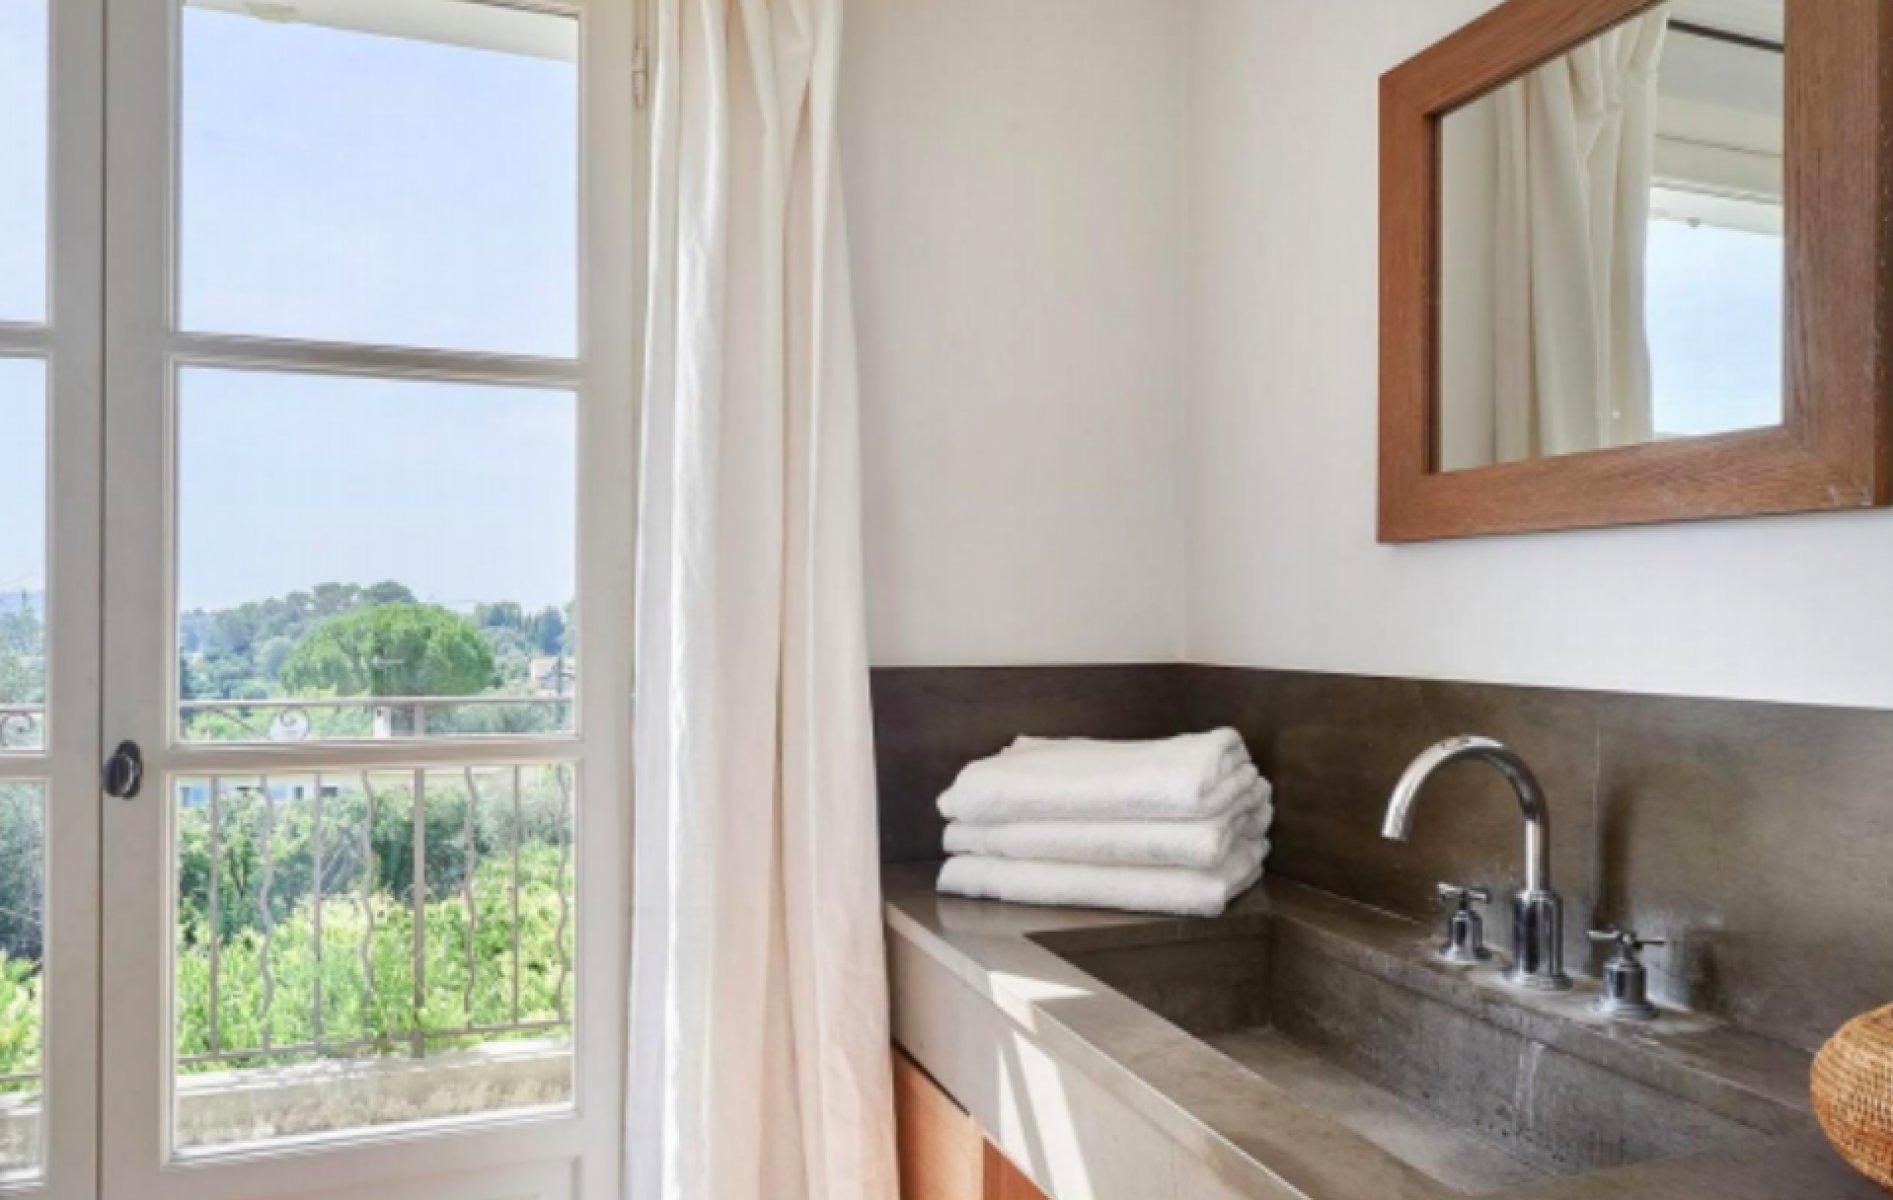 Rent High standing villa in Mougins close to International Mougins school and tennis club